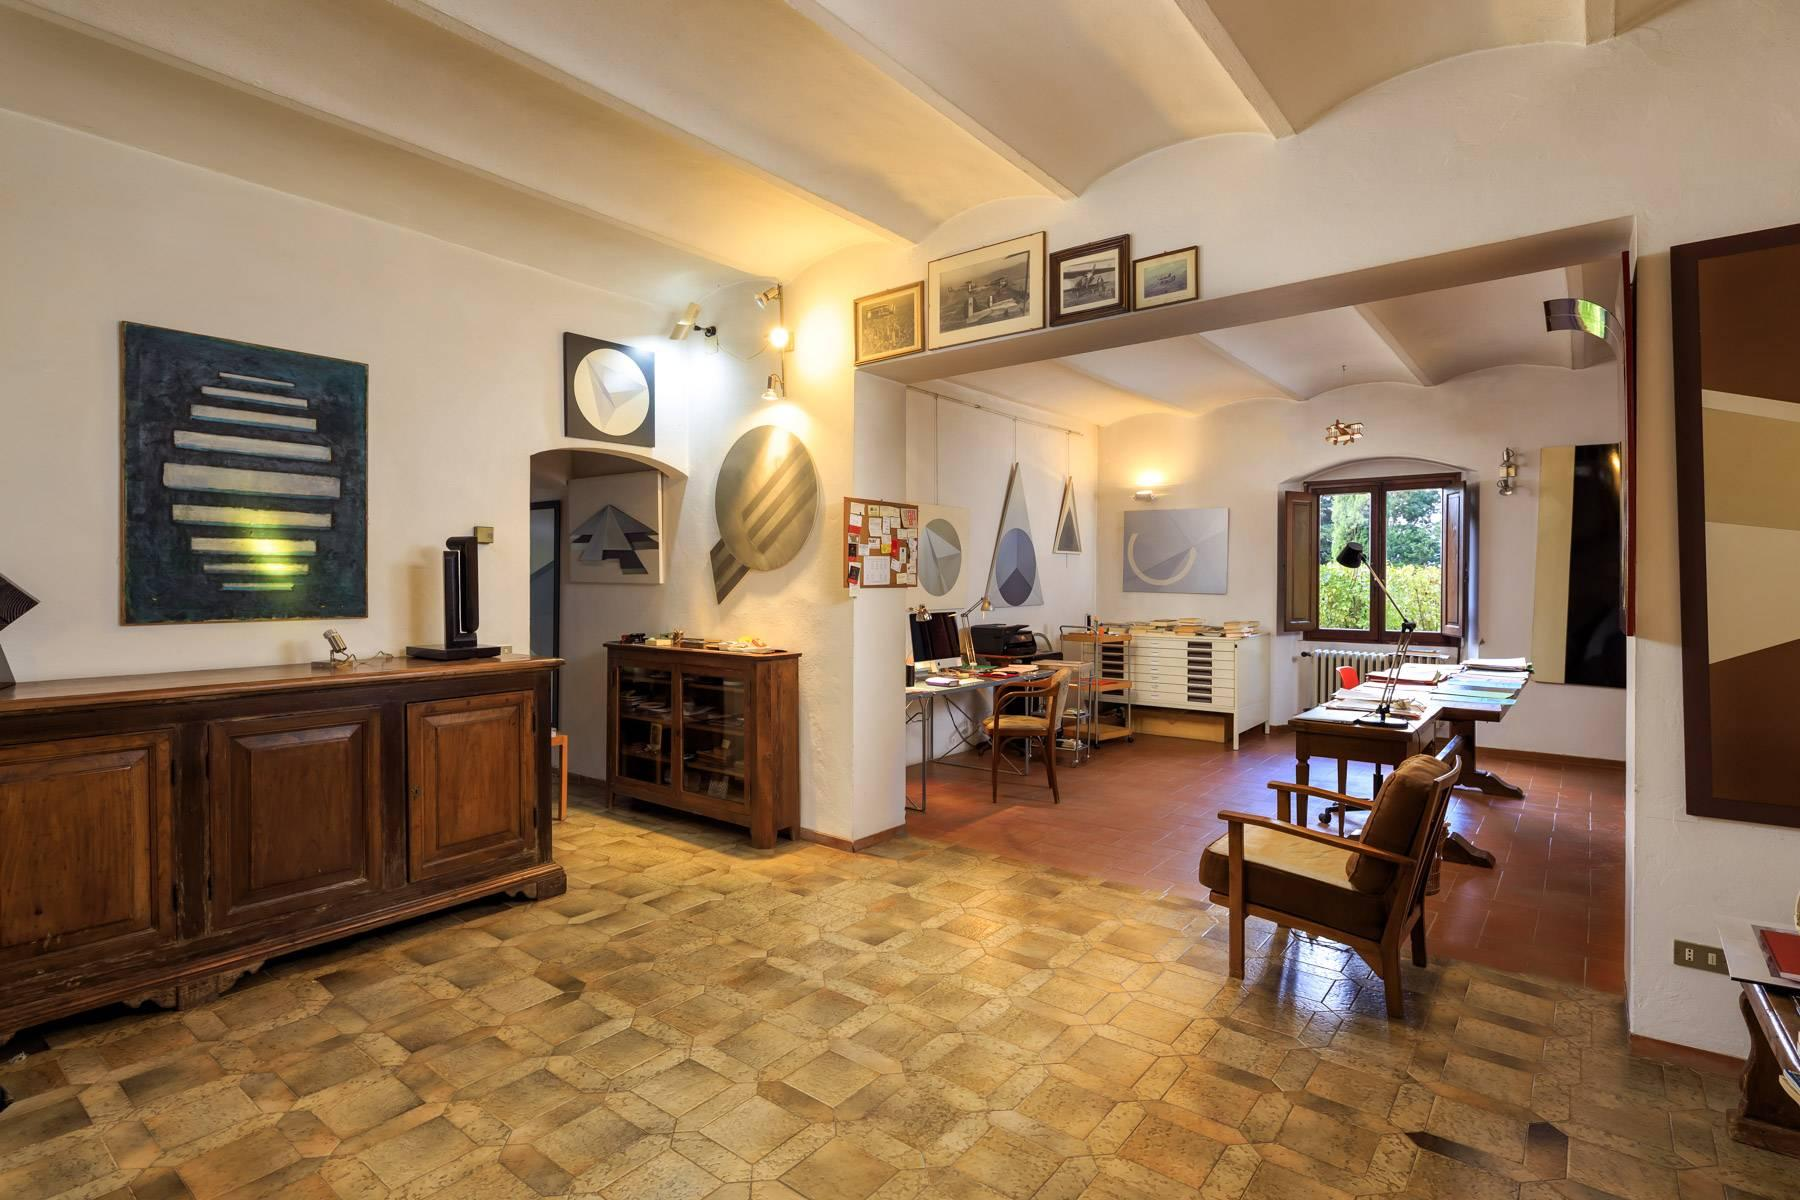 Diana Baylons Haus-Museum - 11